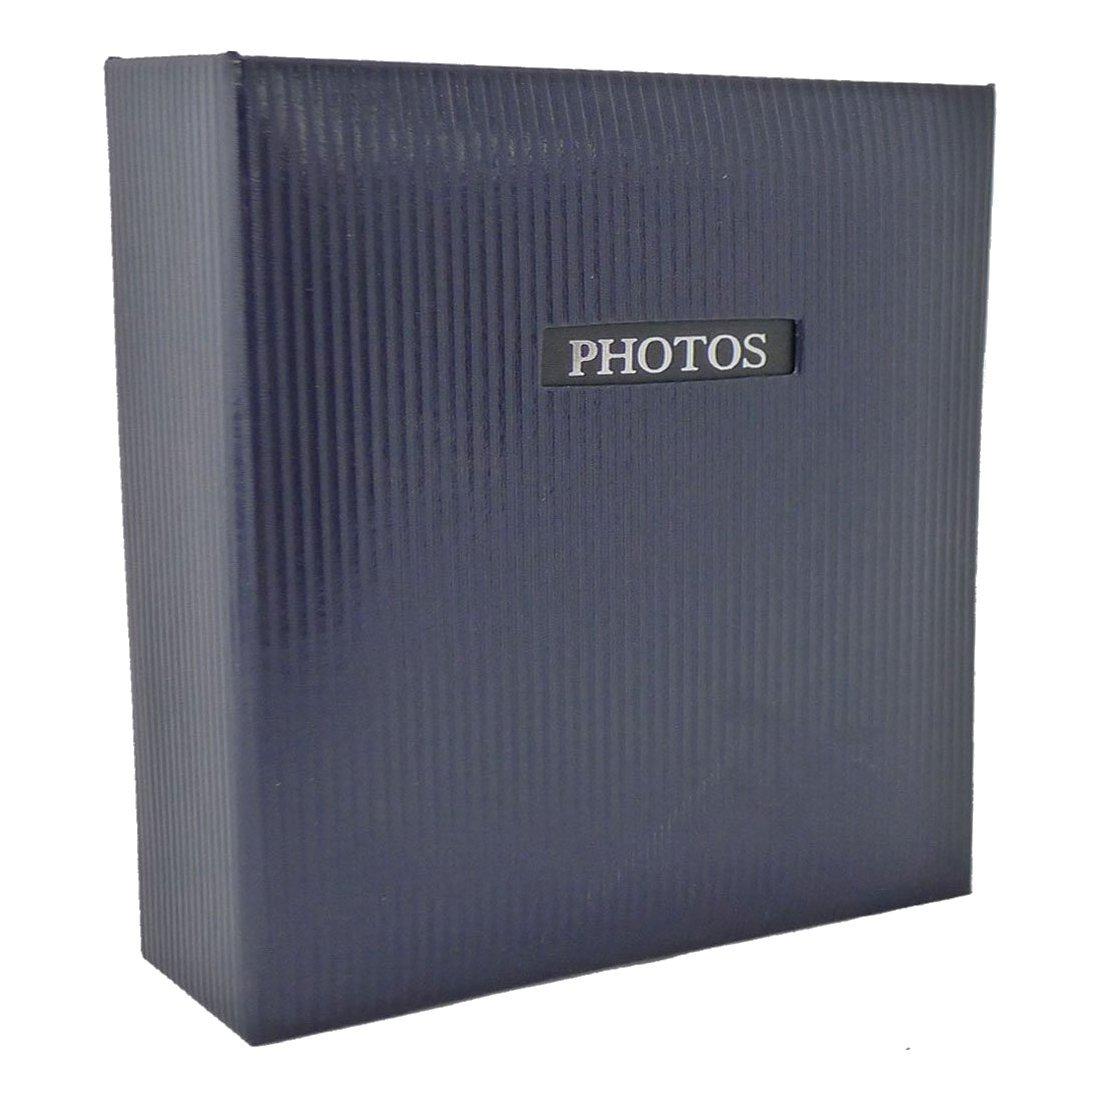 Dorr Elegance Blue Traditional Photo Album 50 Side 11.5x12.5'' [810258BLU]